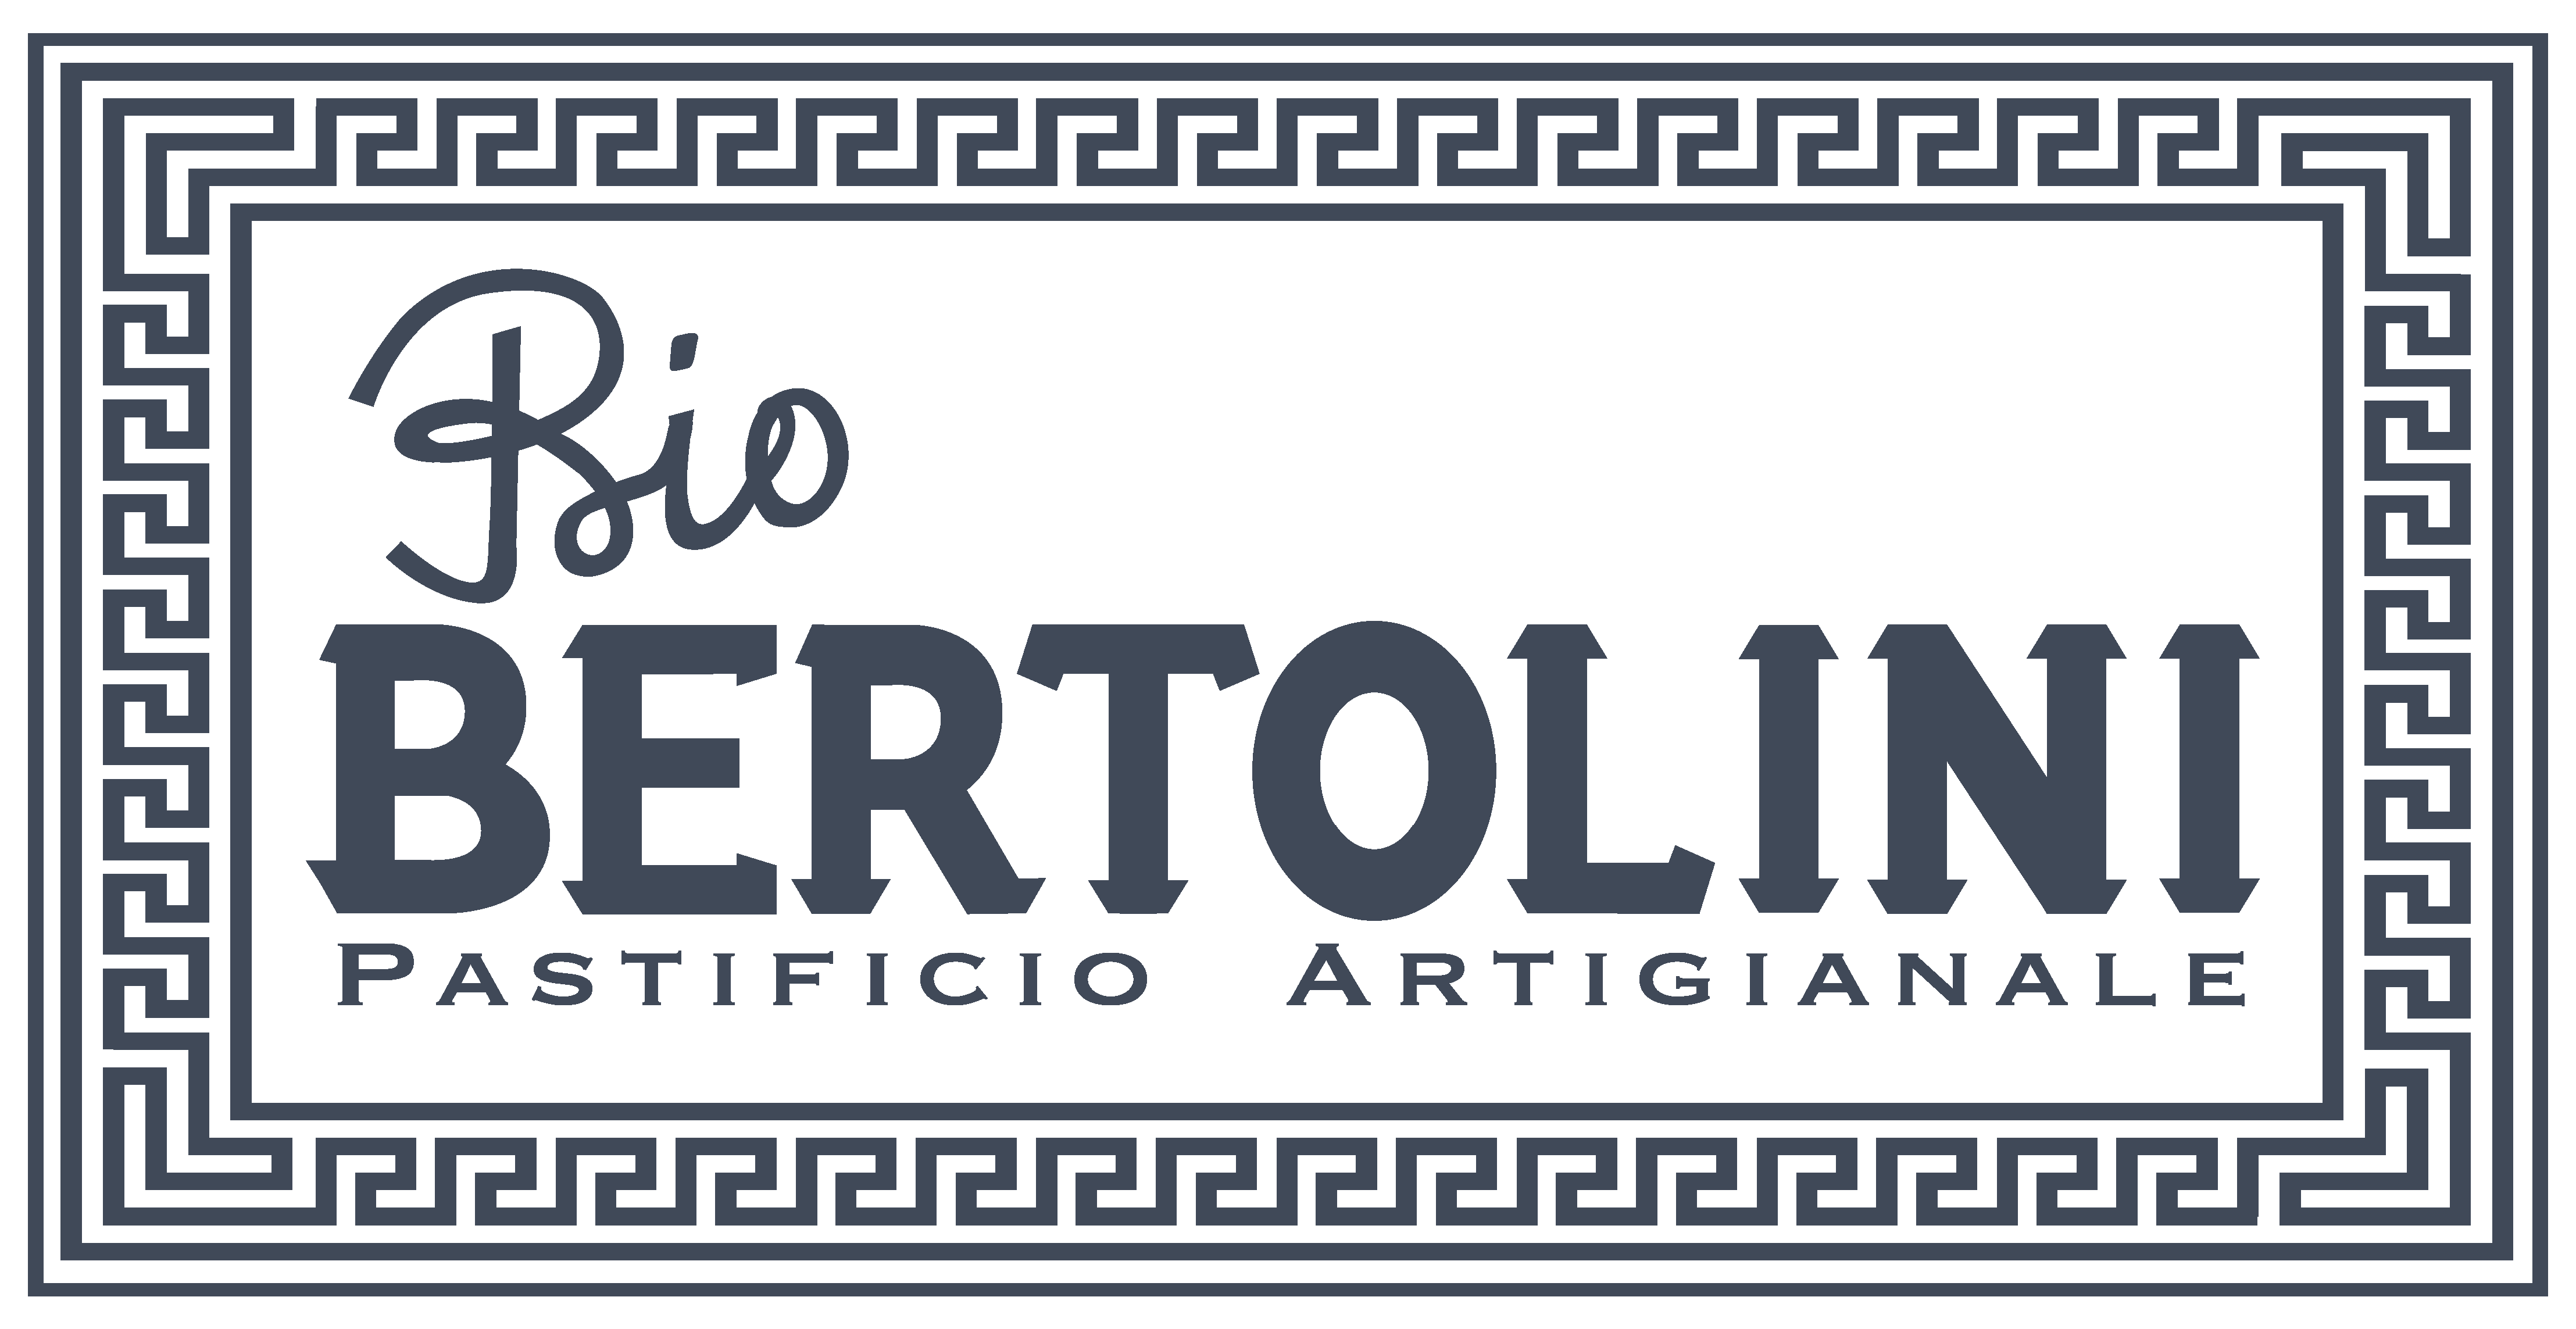 Rio Bertolini's